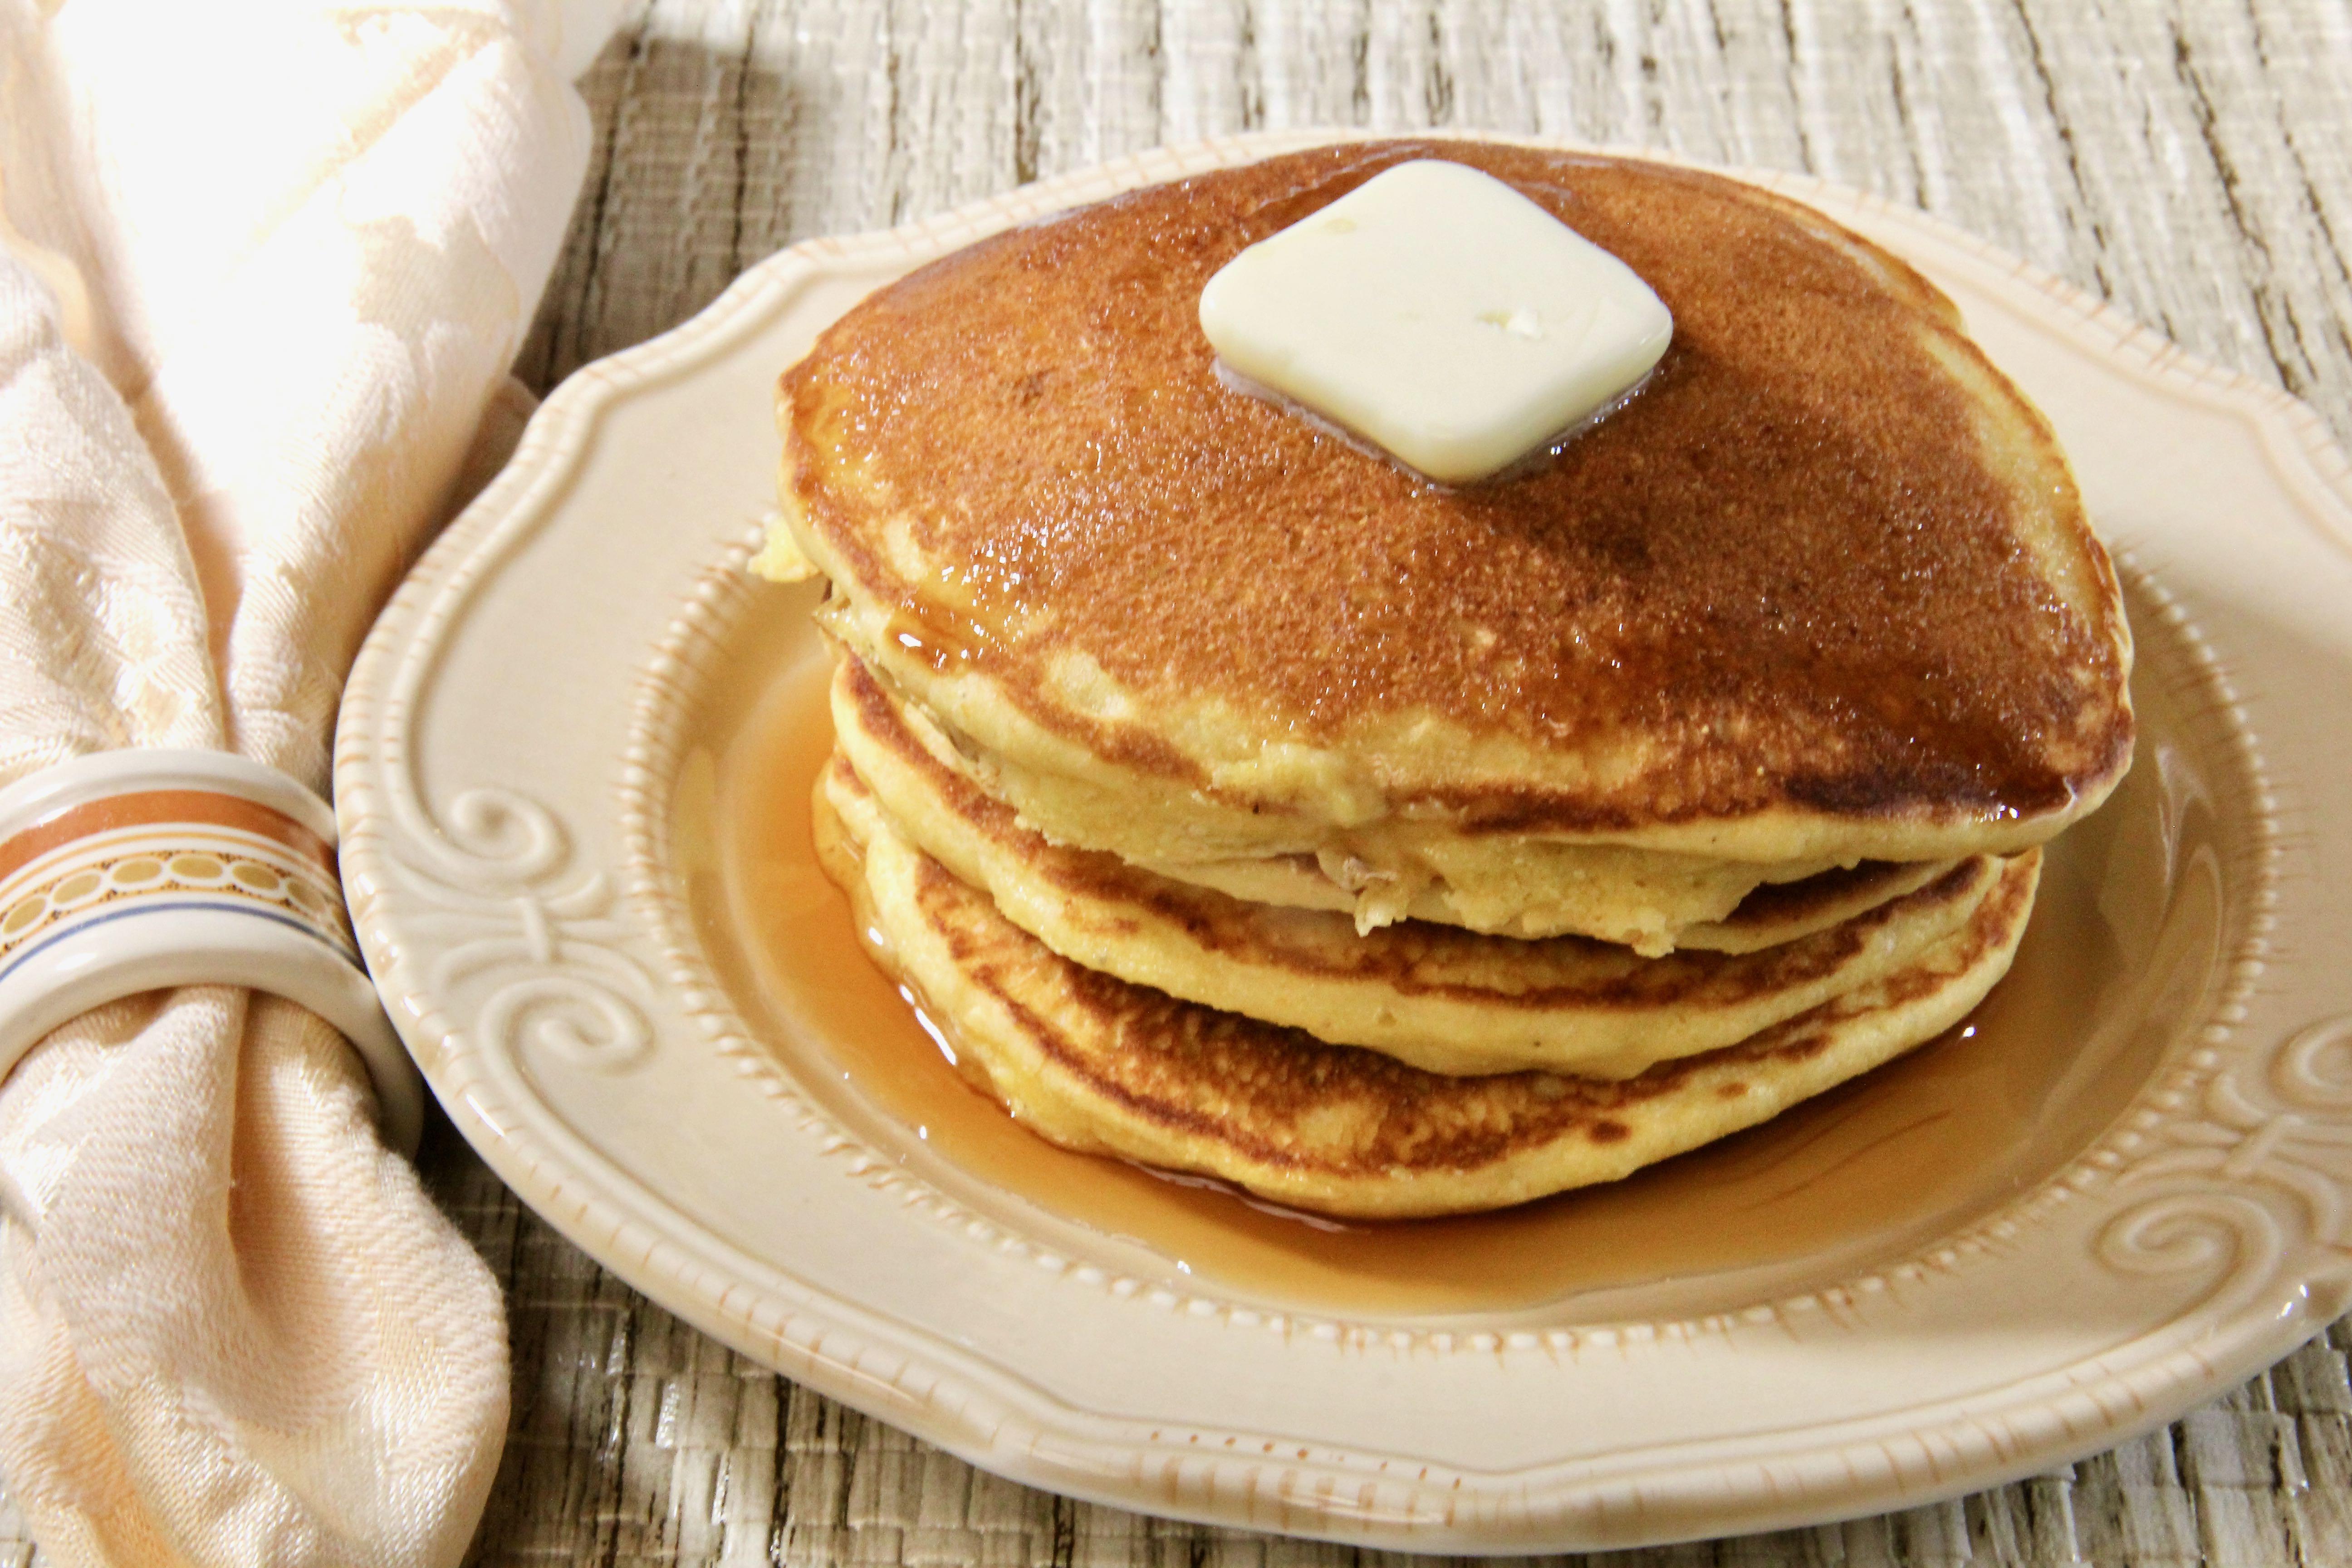 Jordan's Cornmeal Pancakes